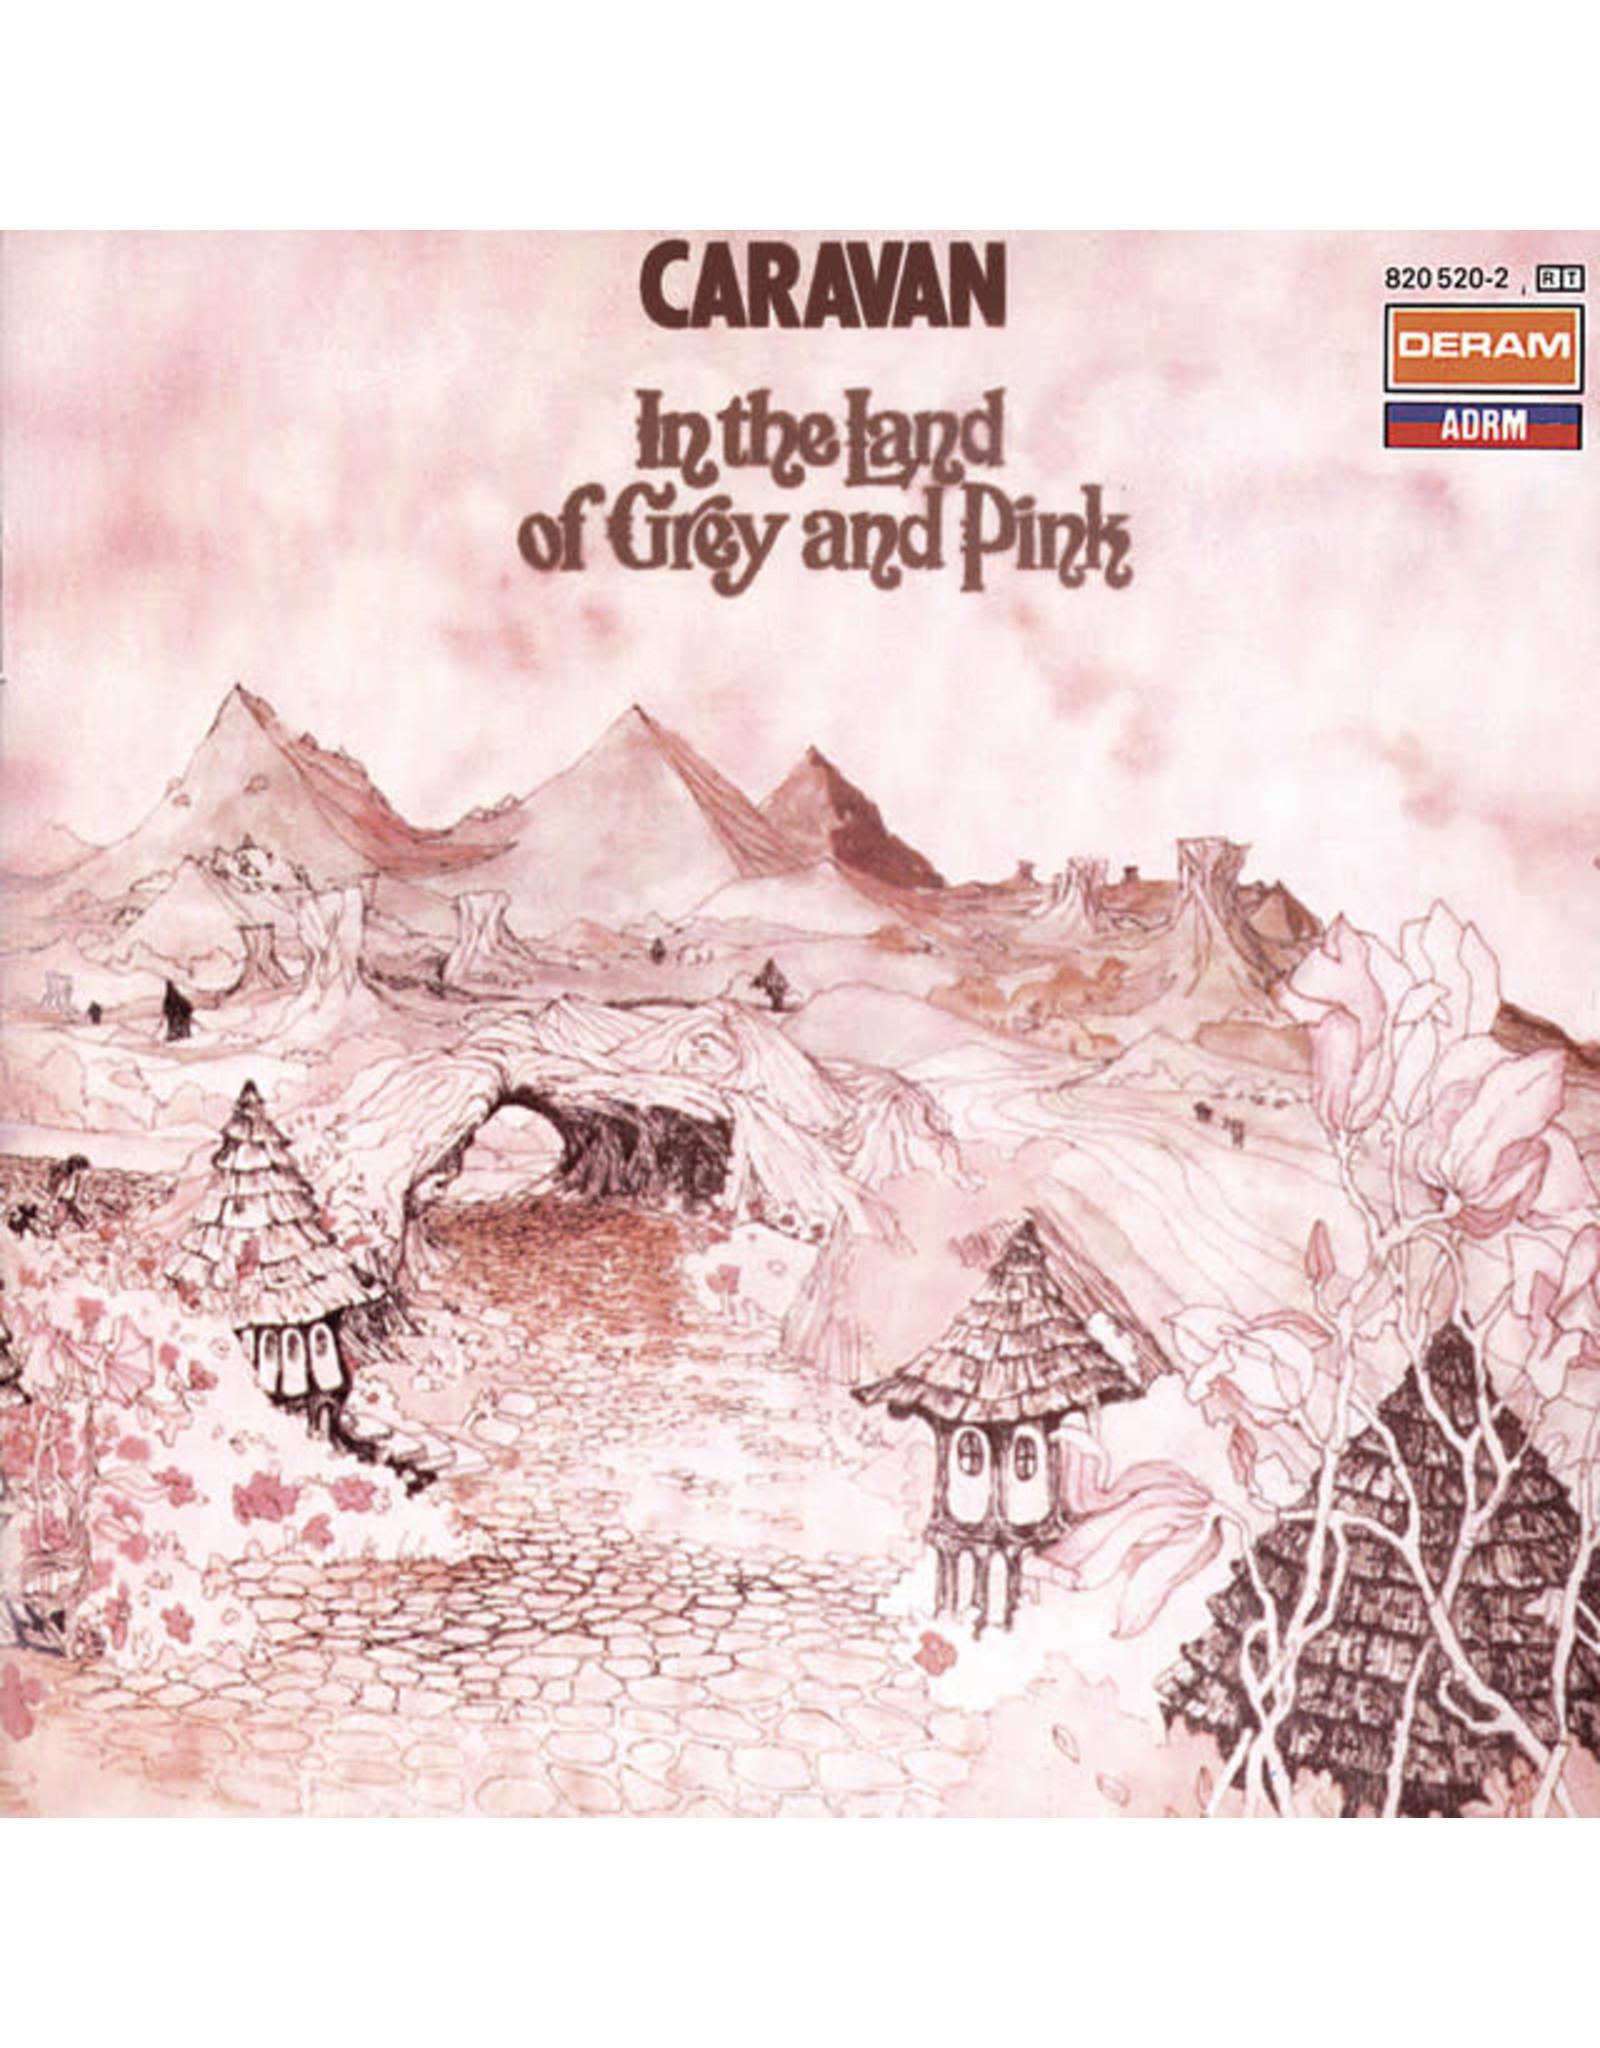 Vinyl Caravan - In The Land Of Grey and Pink